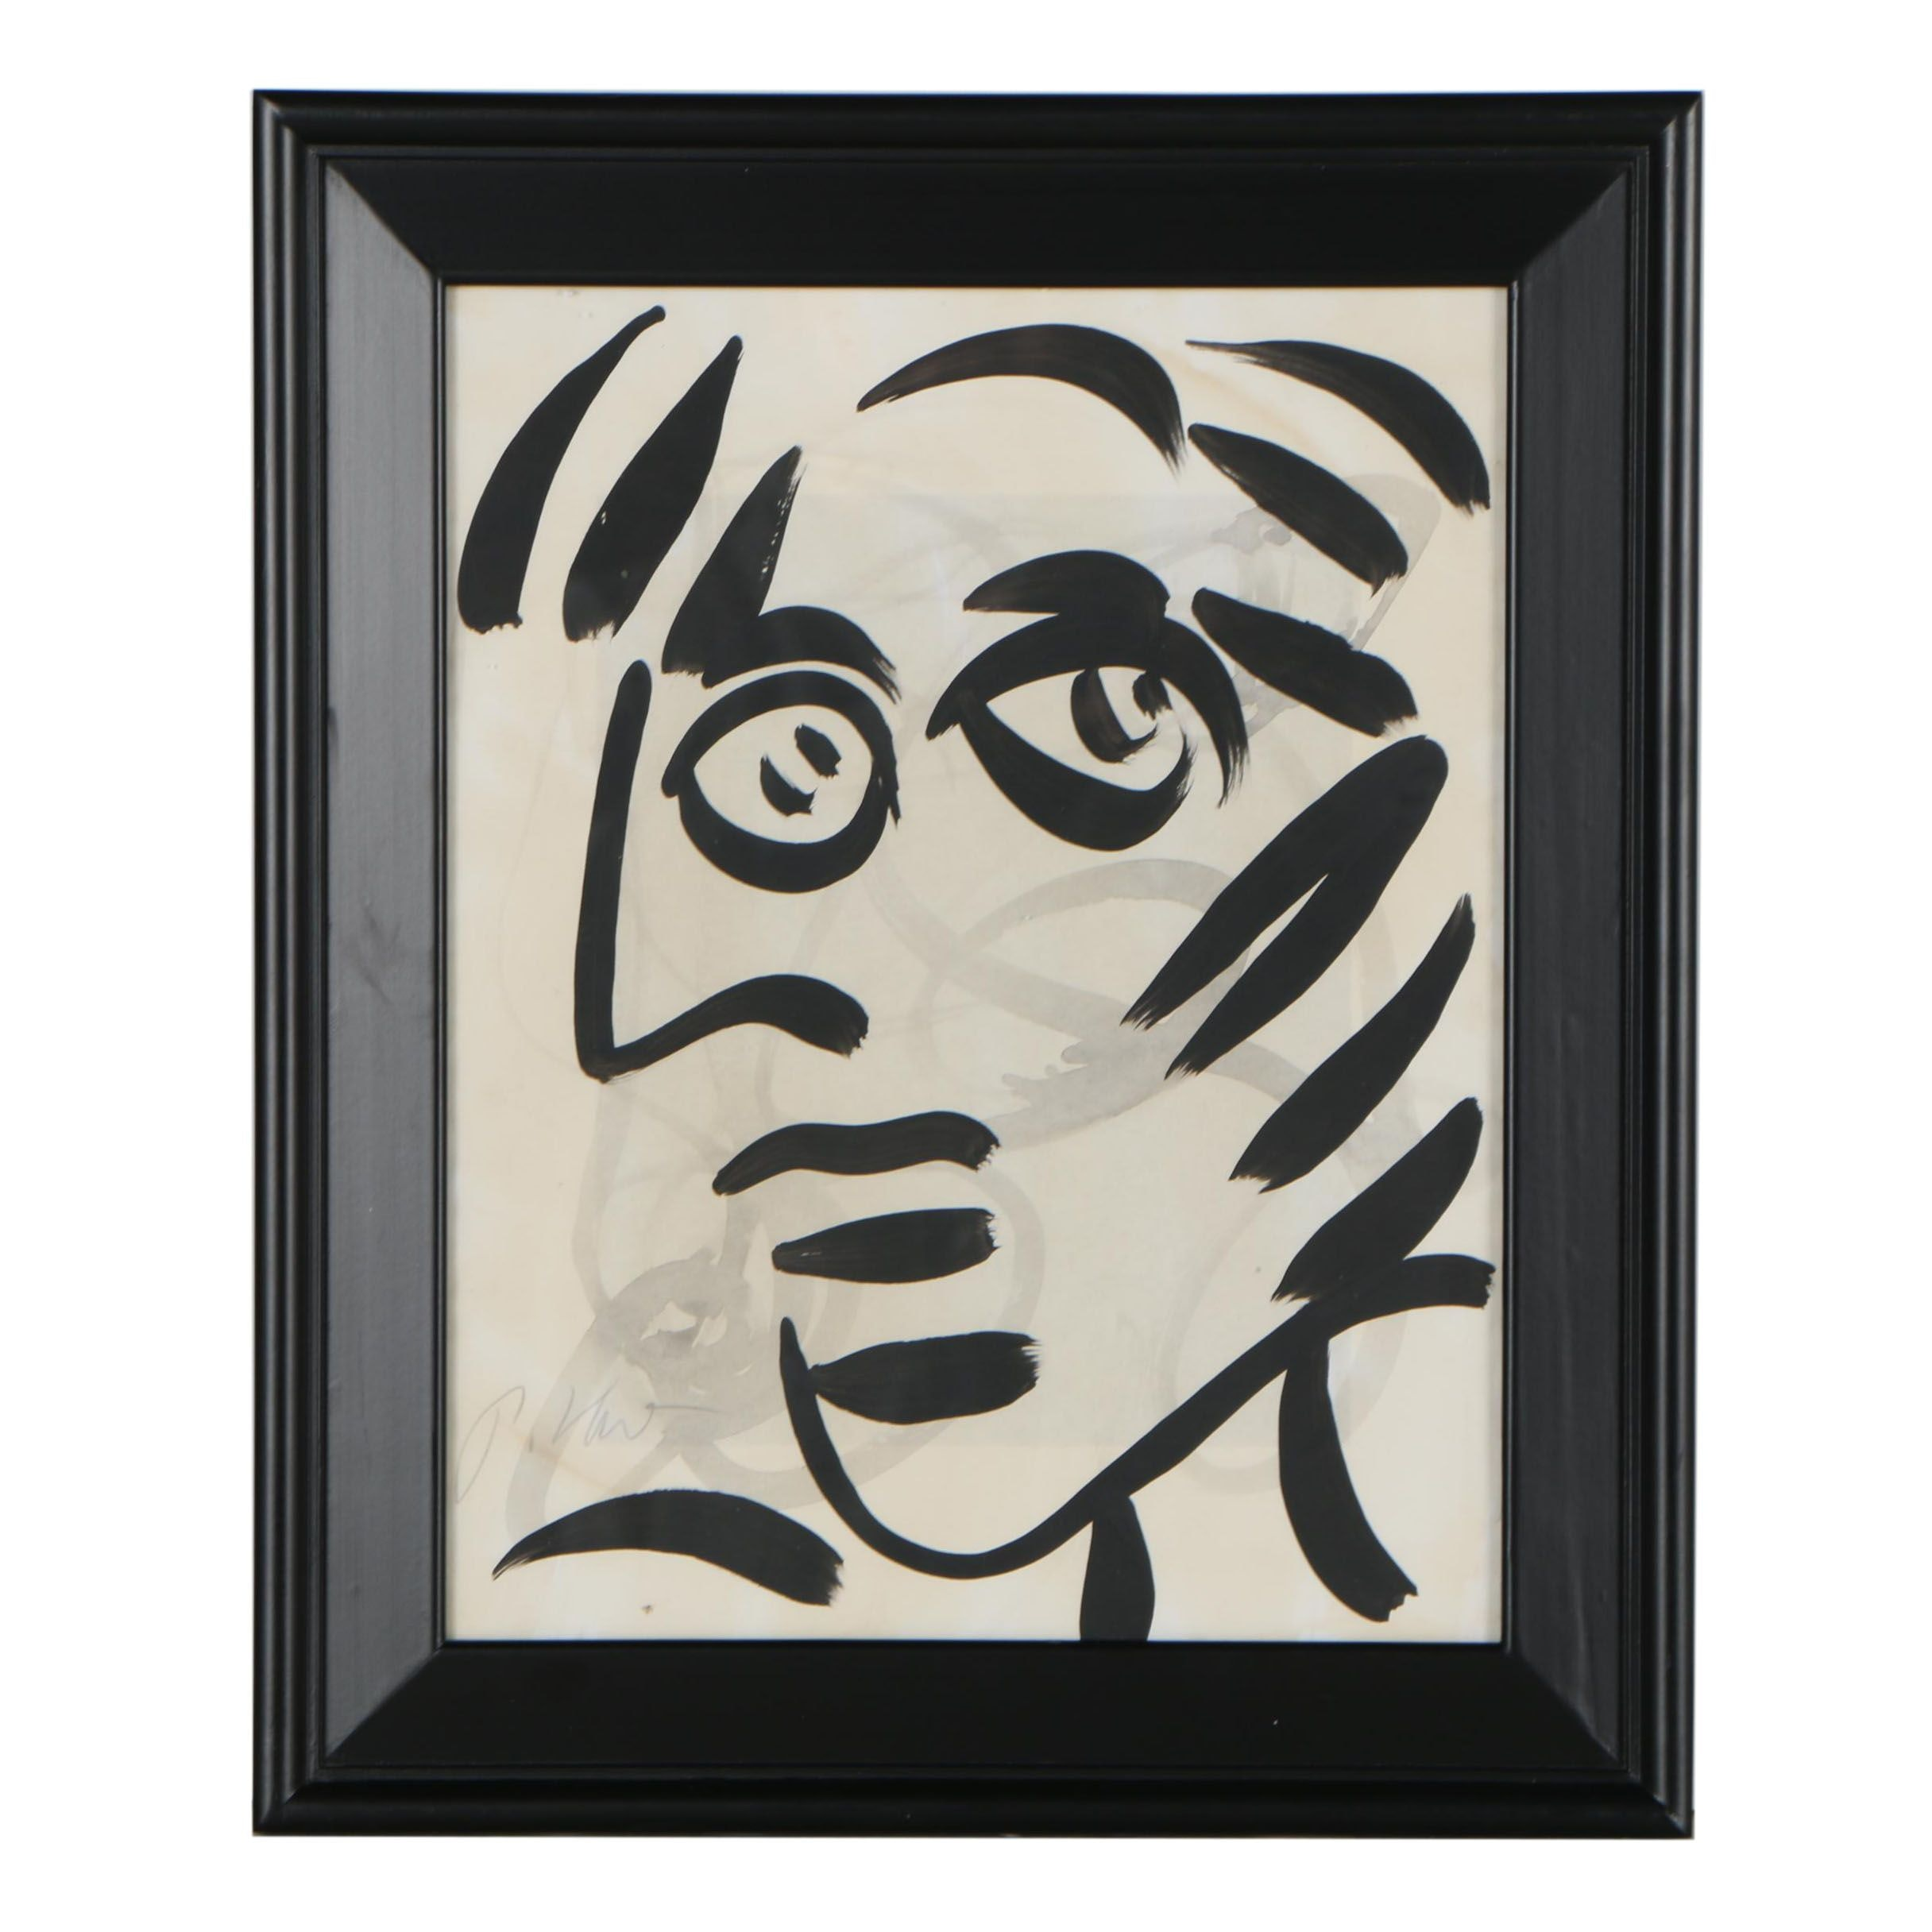 Peter Robert Keil Abstract Acrylic Painting